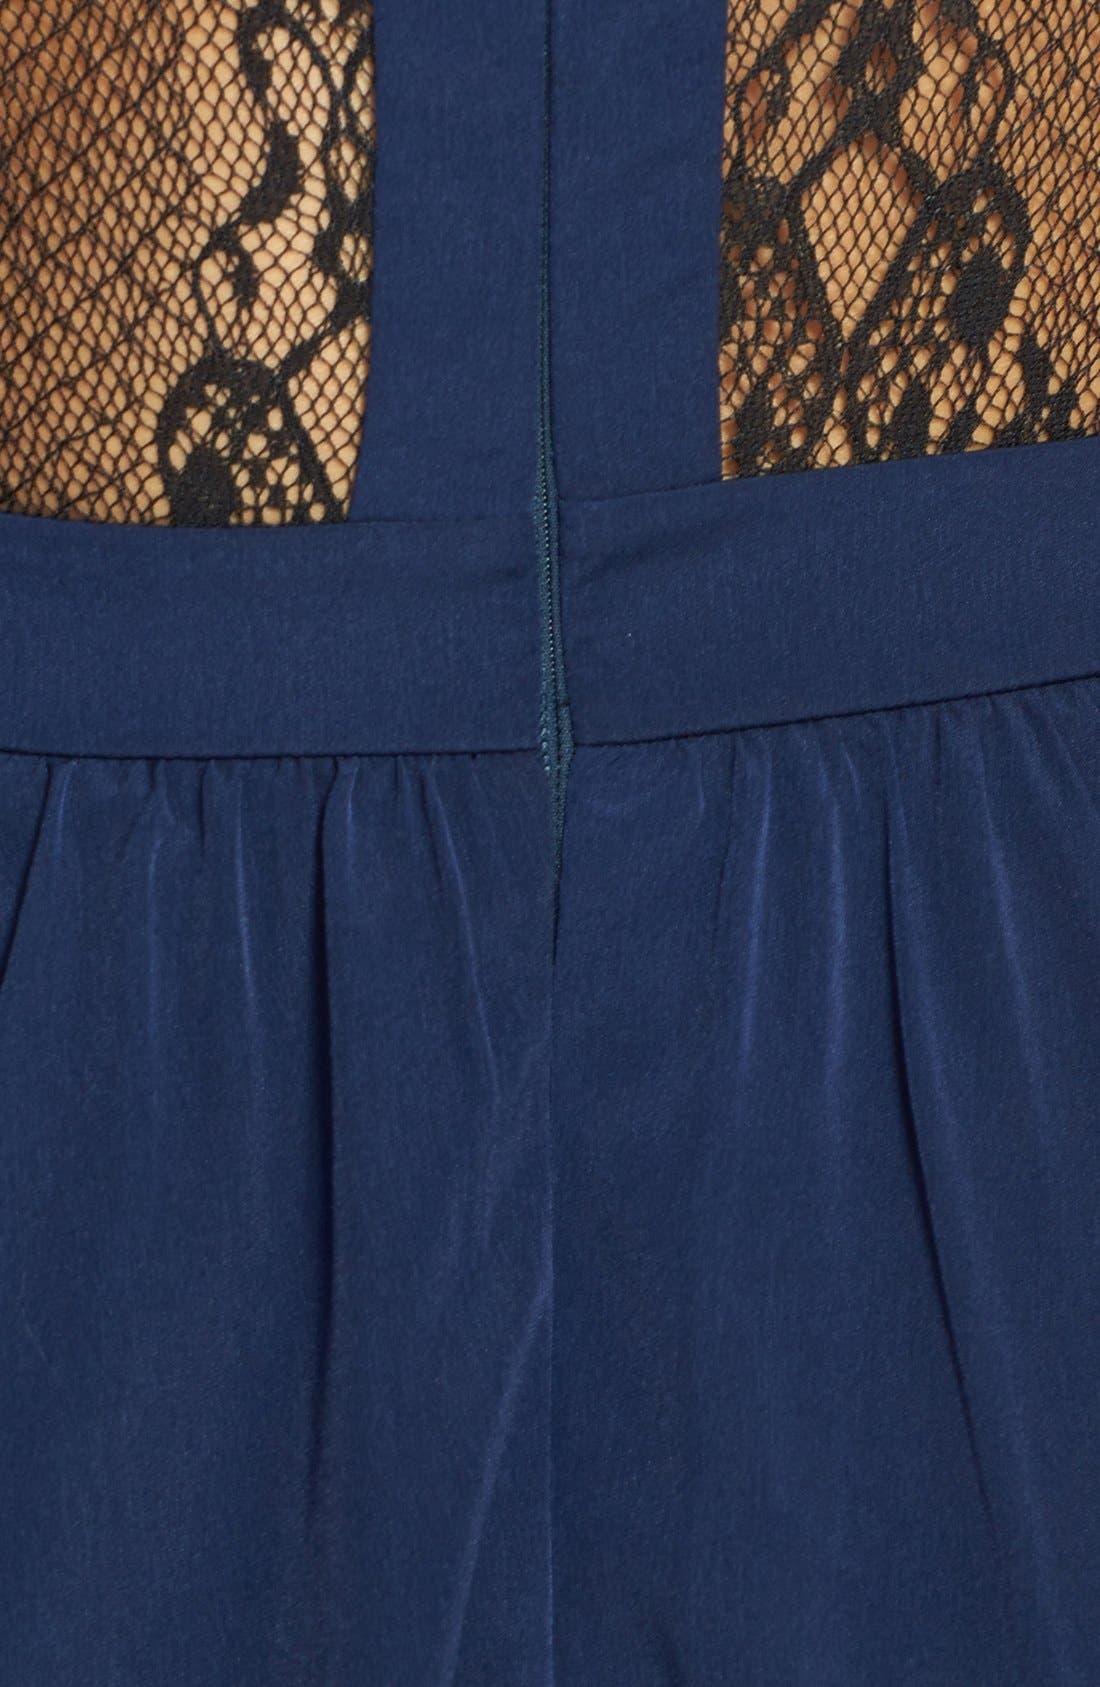 Lace Inset Skater Dress,                             Alternate thumbnail 3, color,                             400